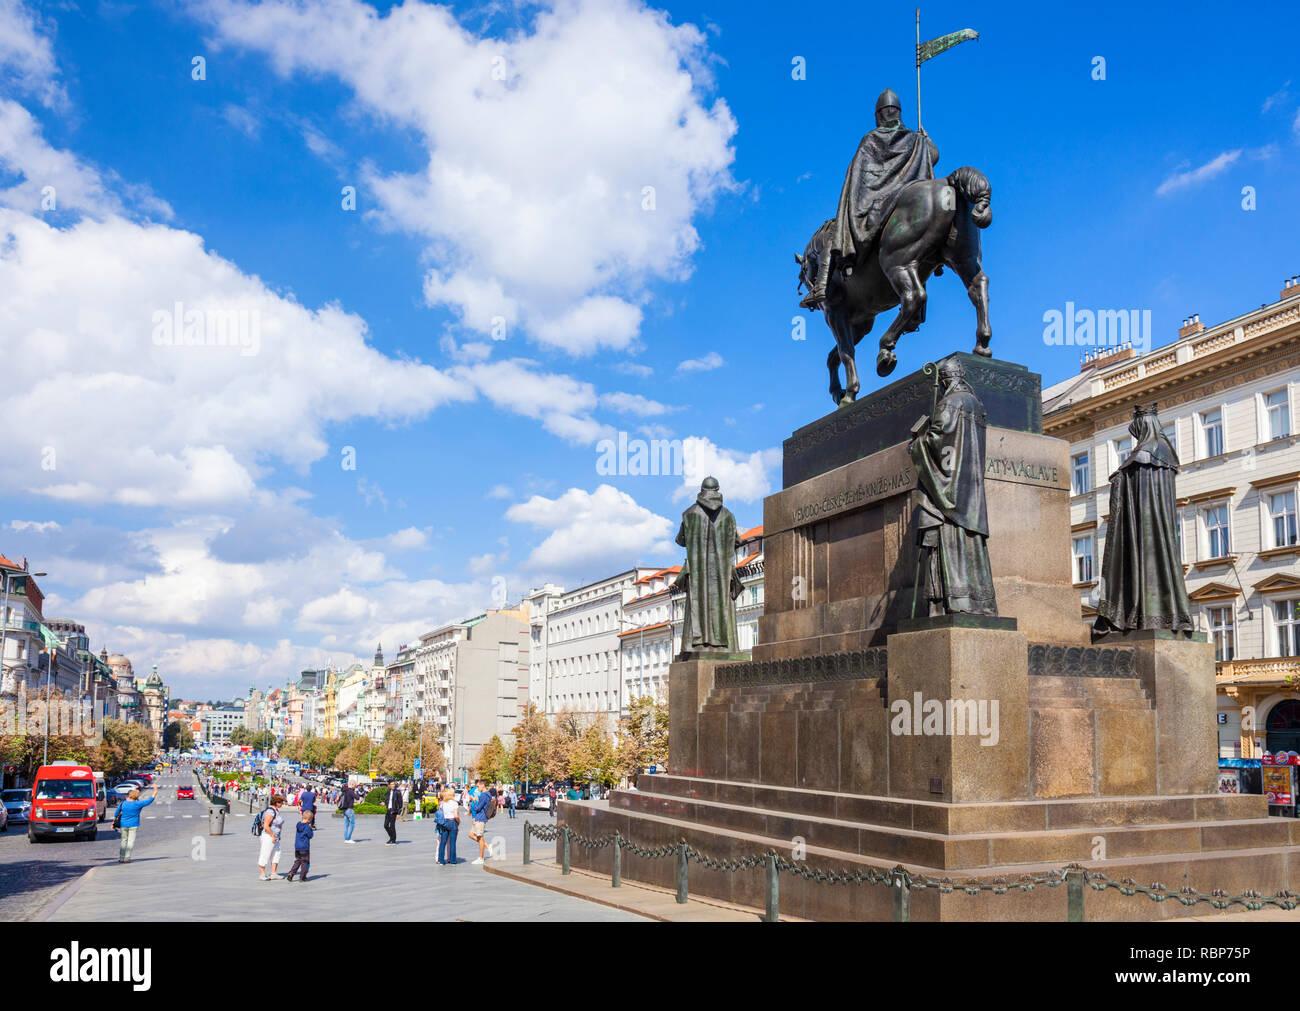 Praga statua di San Venceslao Venceslao Wenceslas Square Praga Repubblica Ceca Europa Immagini Stock